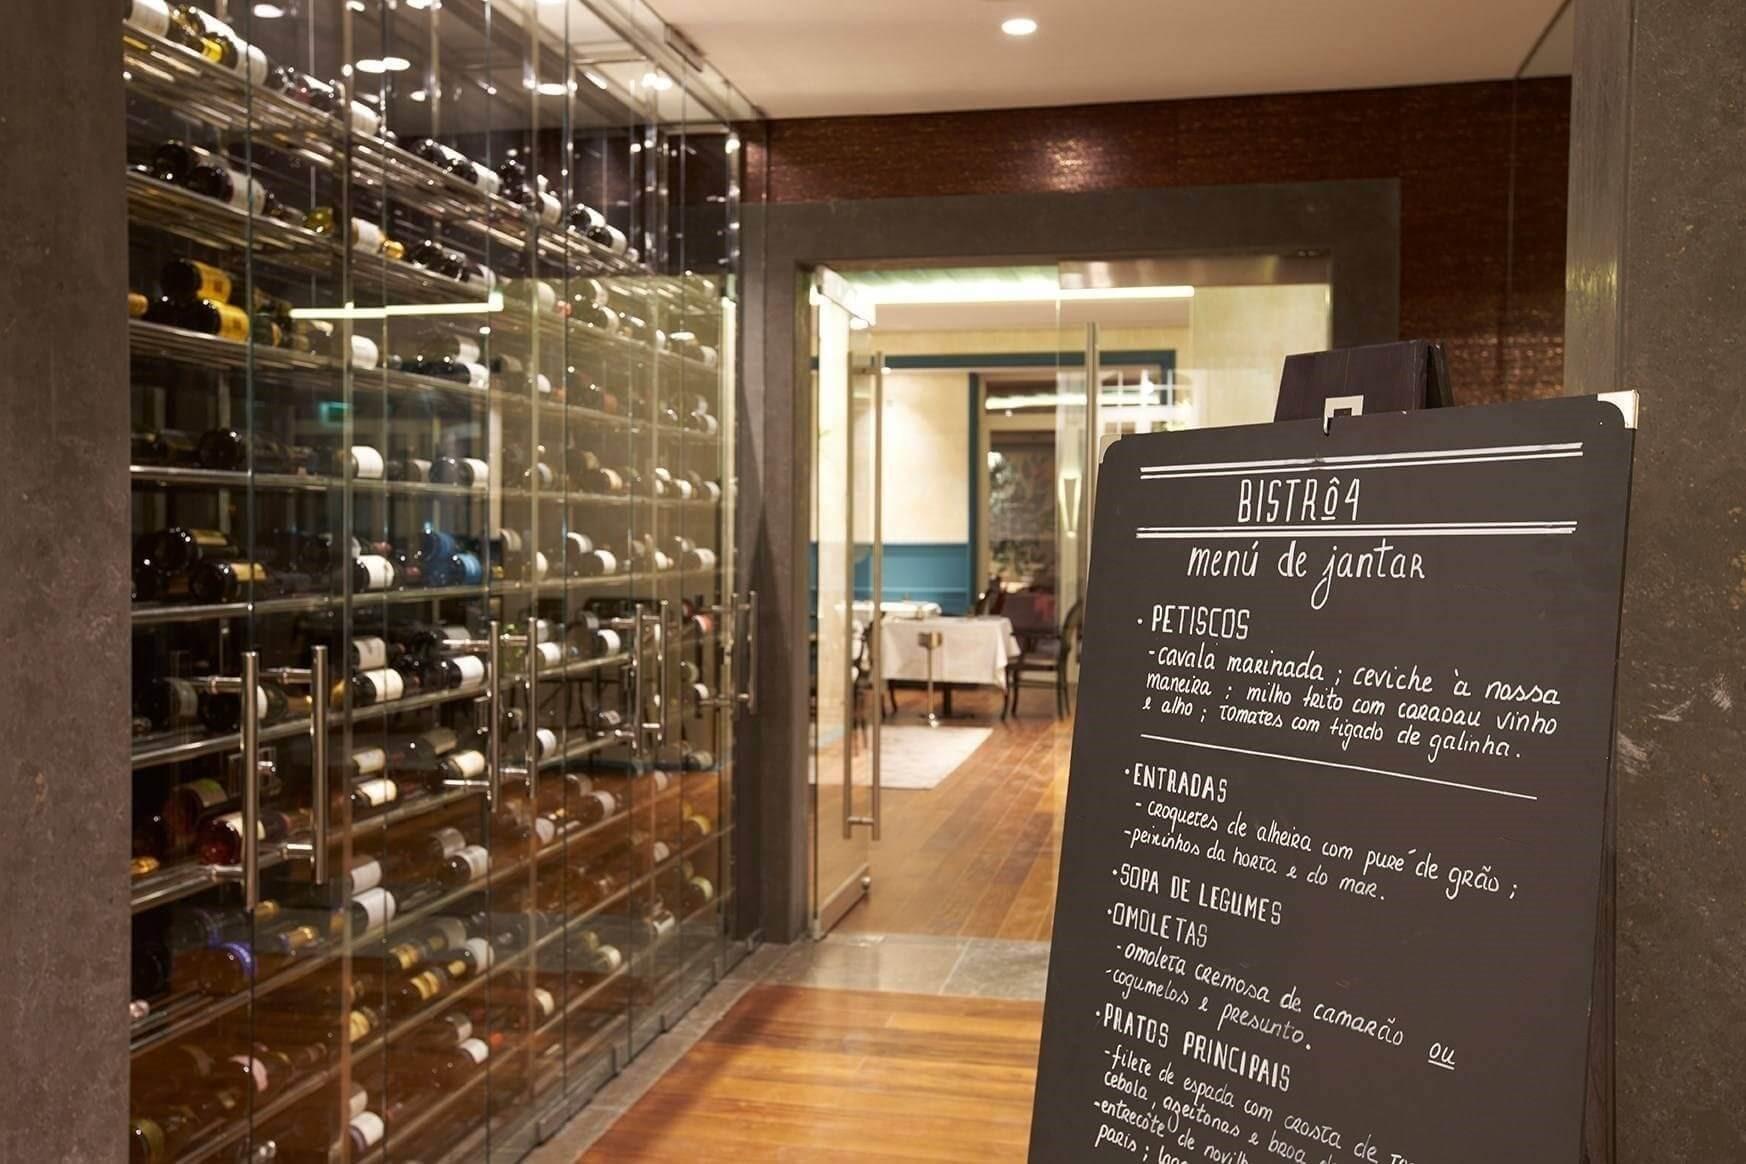 PortoBay Liberdade - Bistro4 Wine Cellar